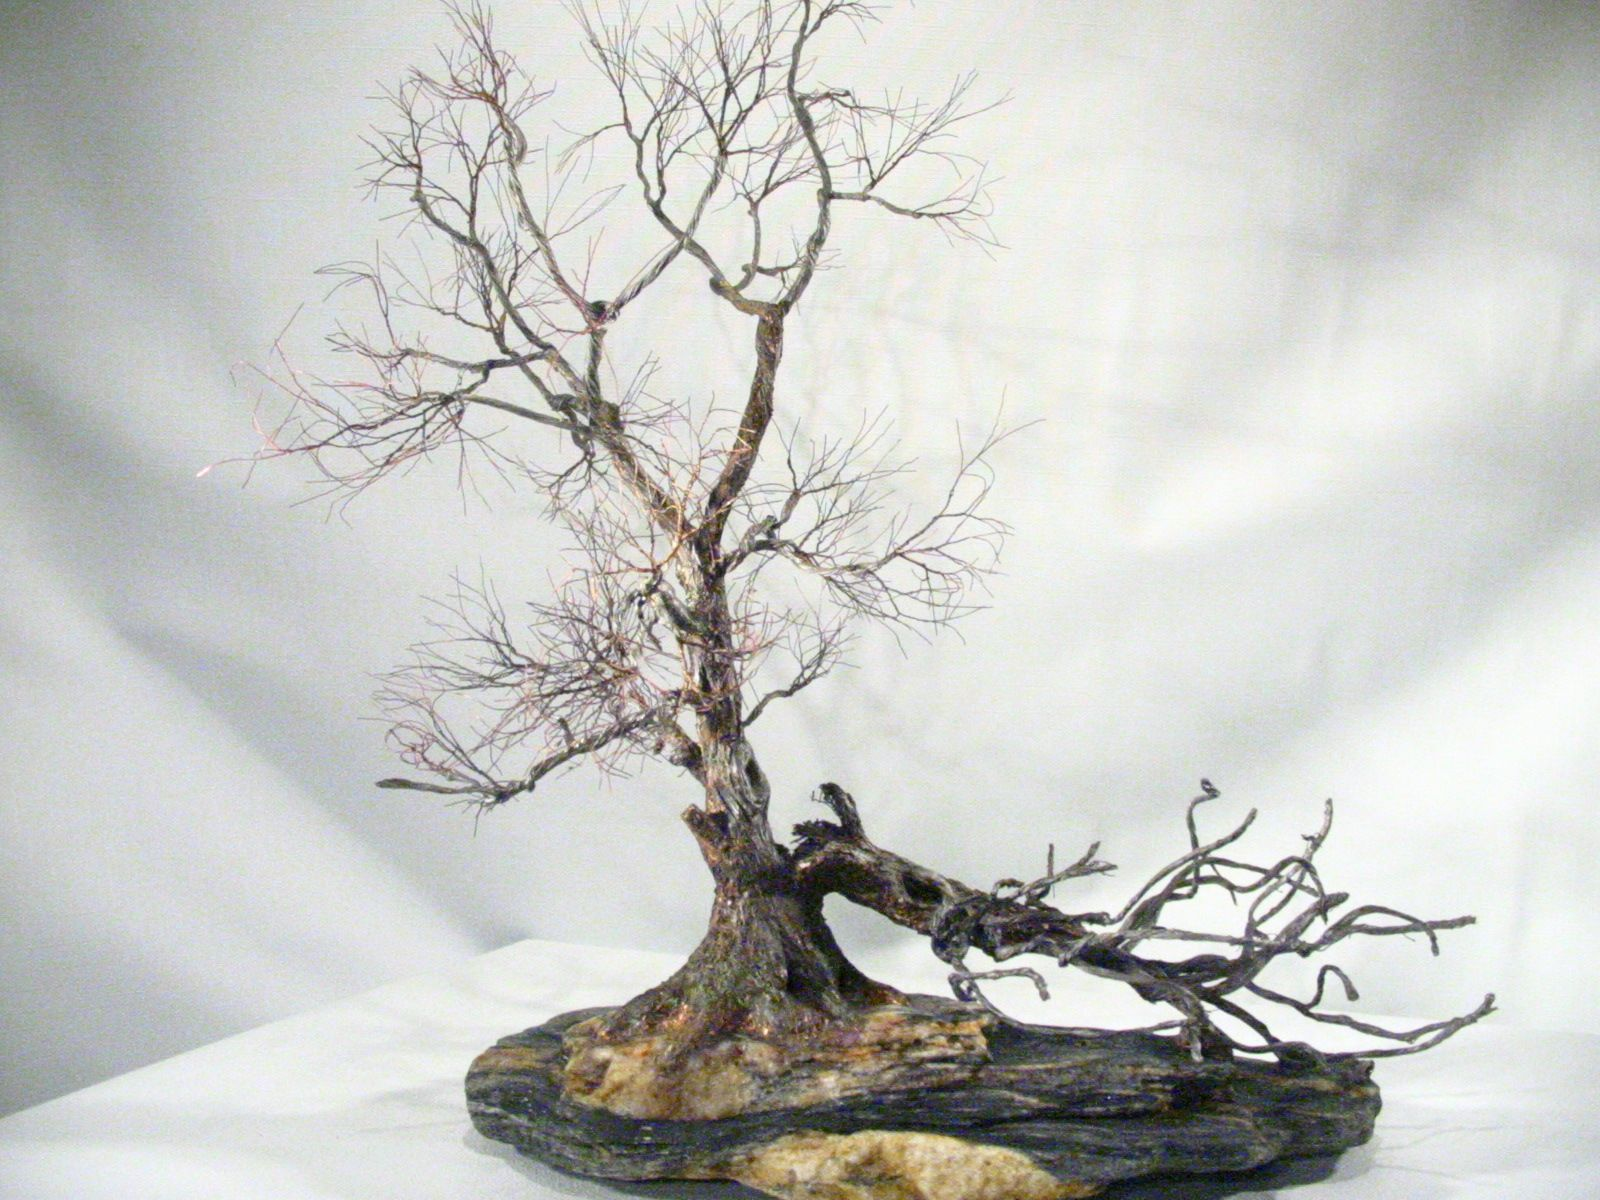 Copper wire tree - Bonsai style - Art sculpture - natural rock ...